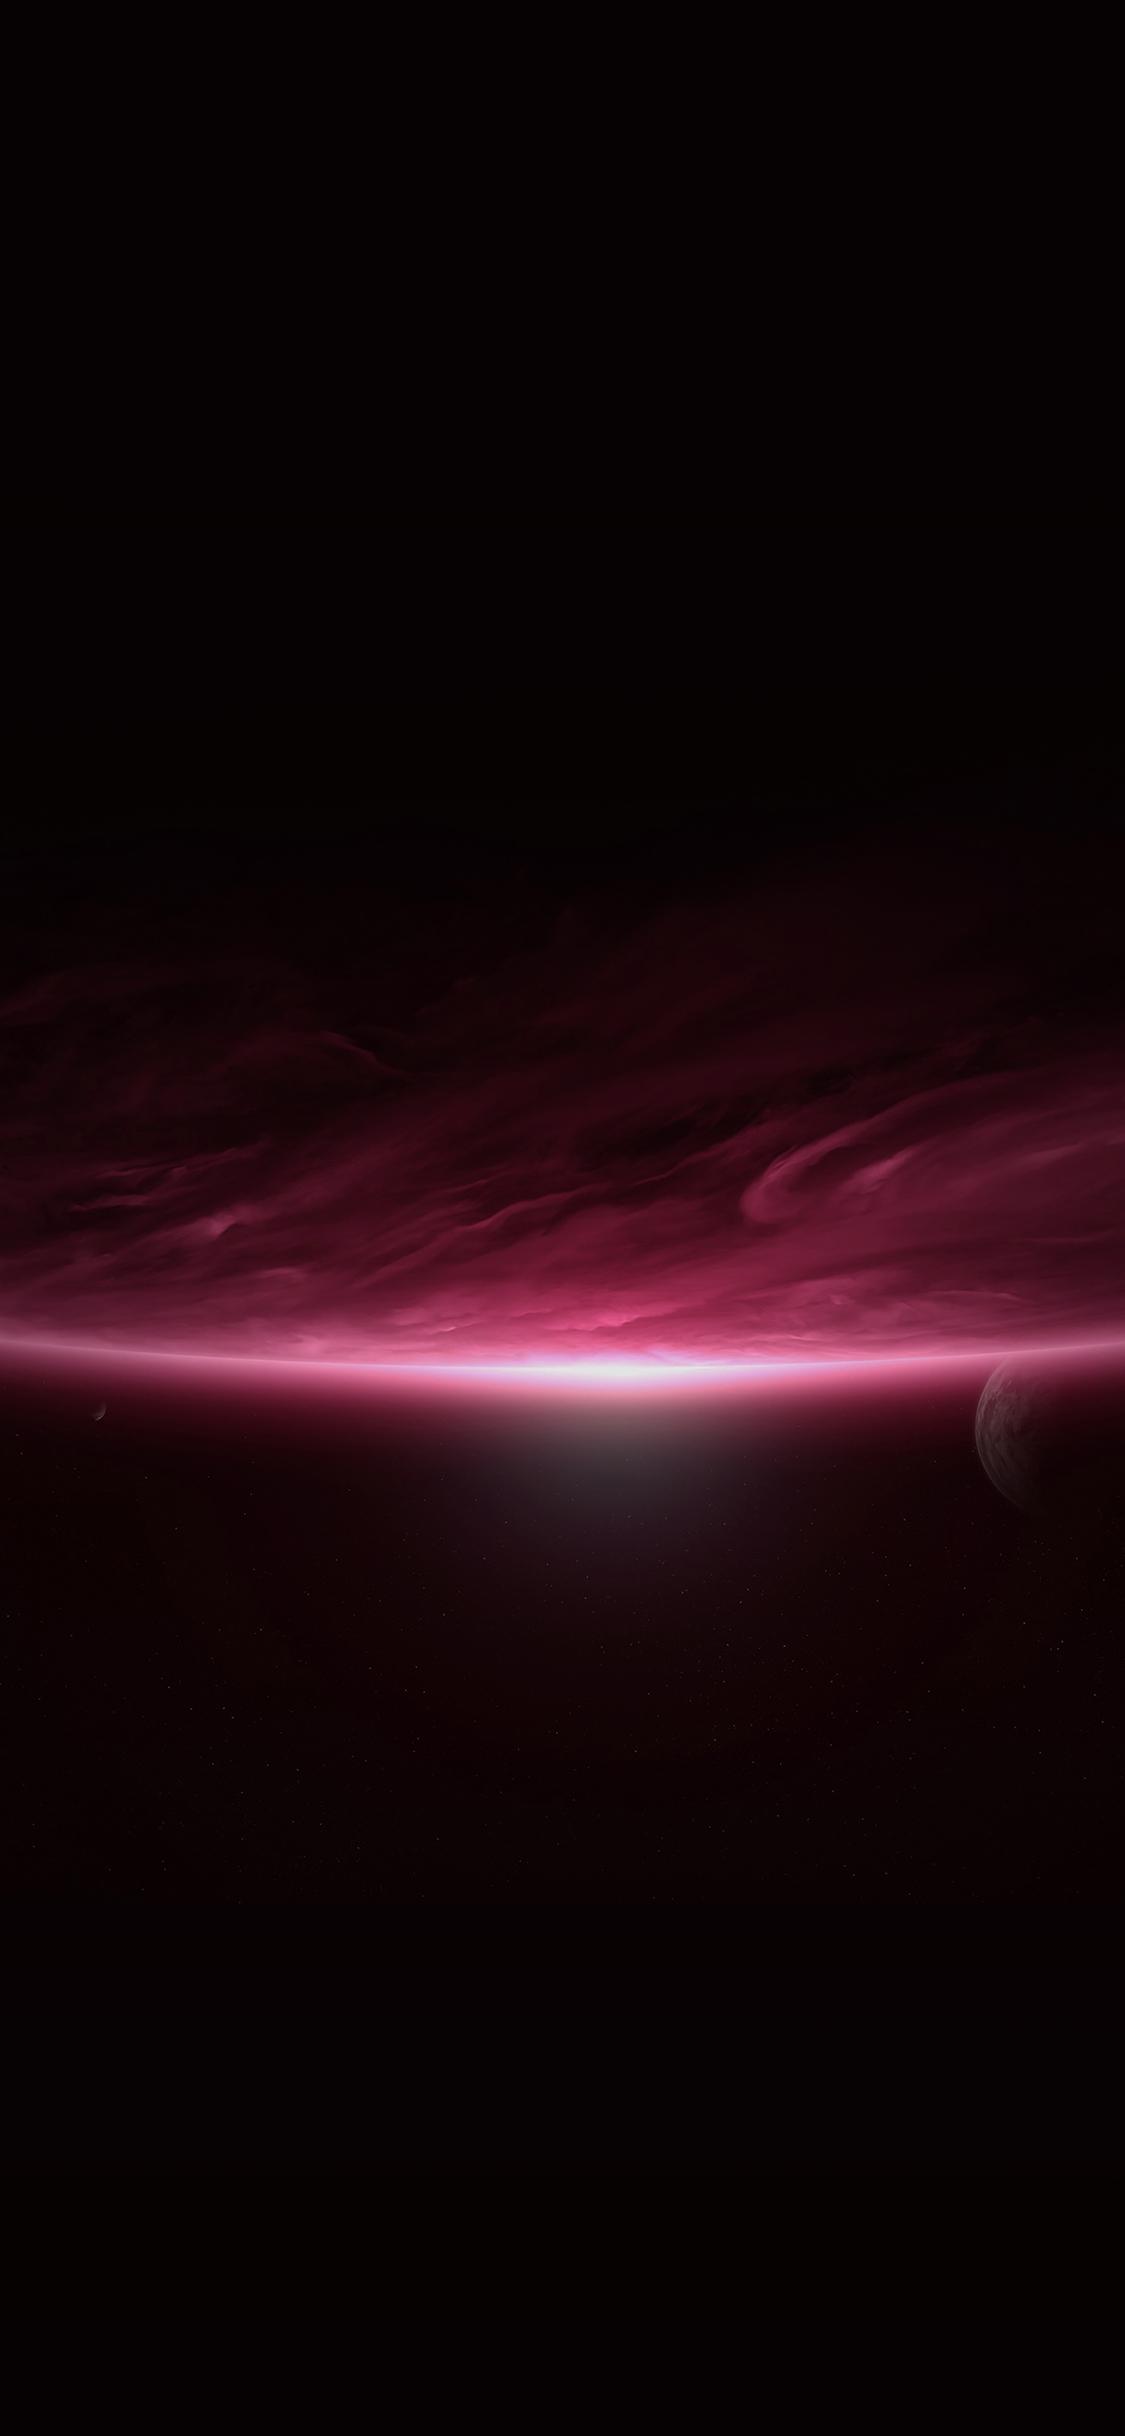 iPhoneXpapers.com-Apple-iPhone-wallpaper-ml52-space-sunrise-red-dark-minimal